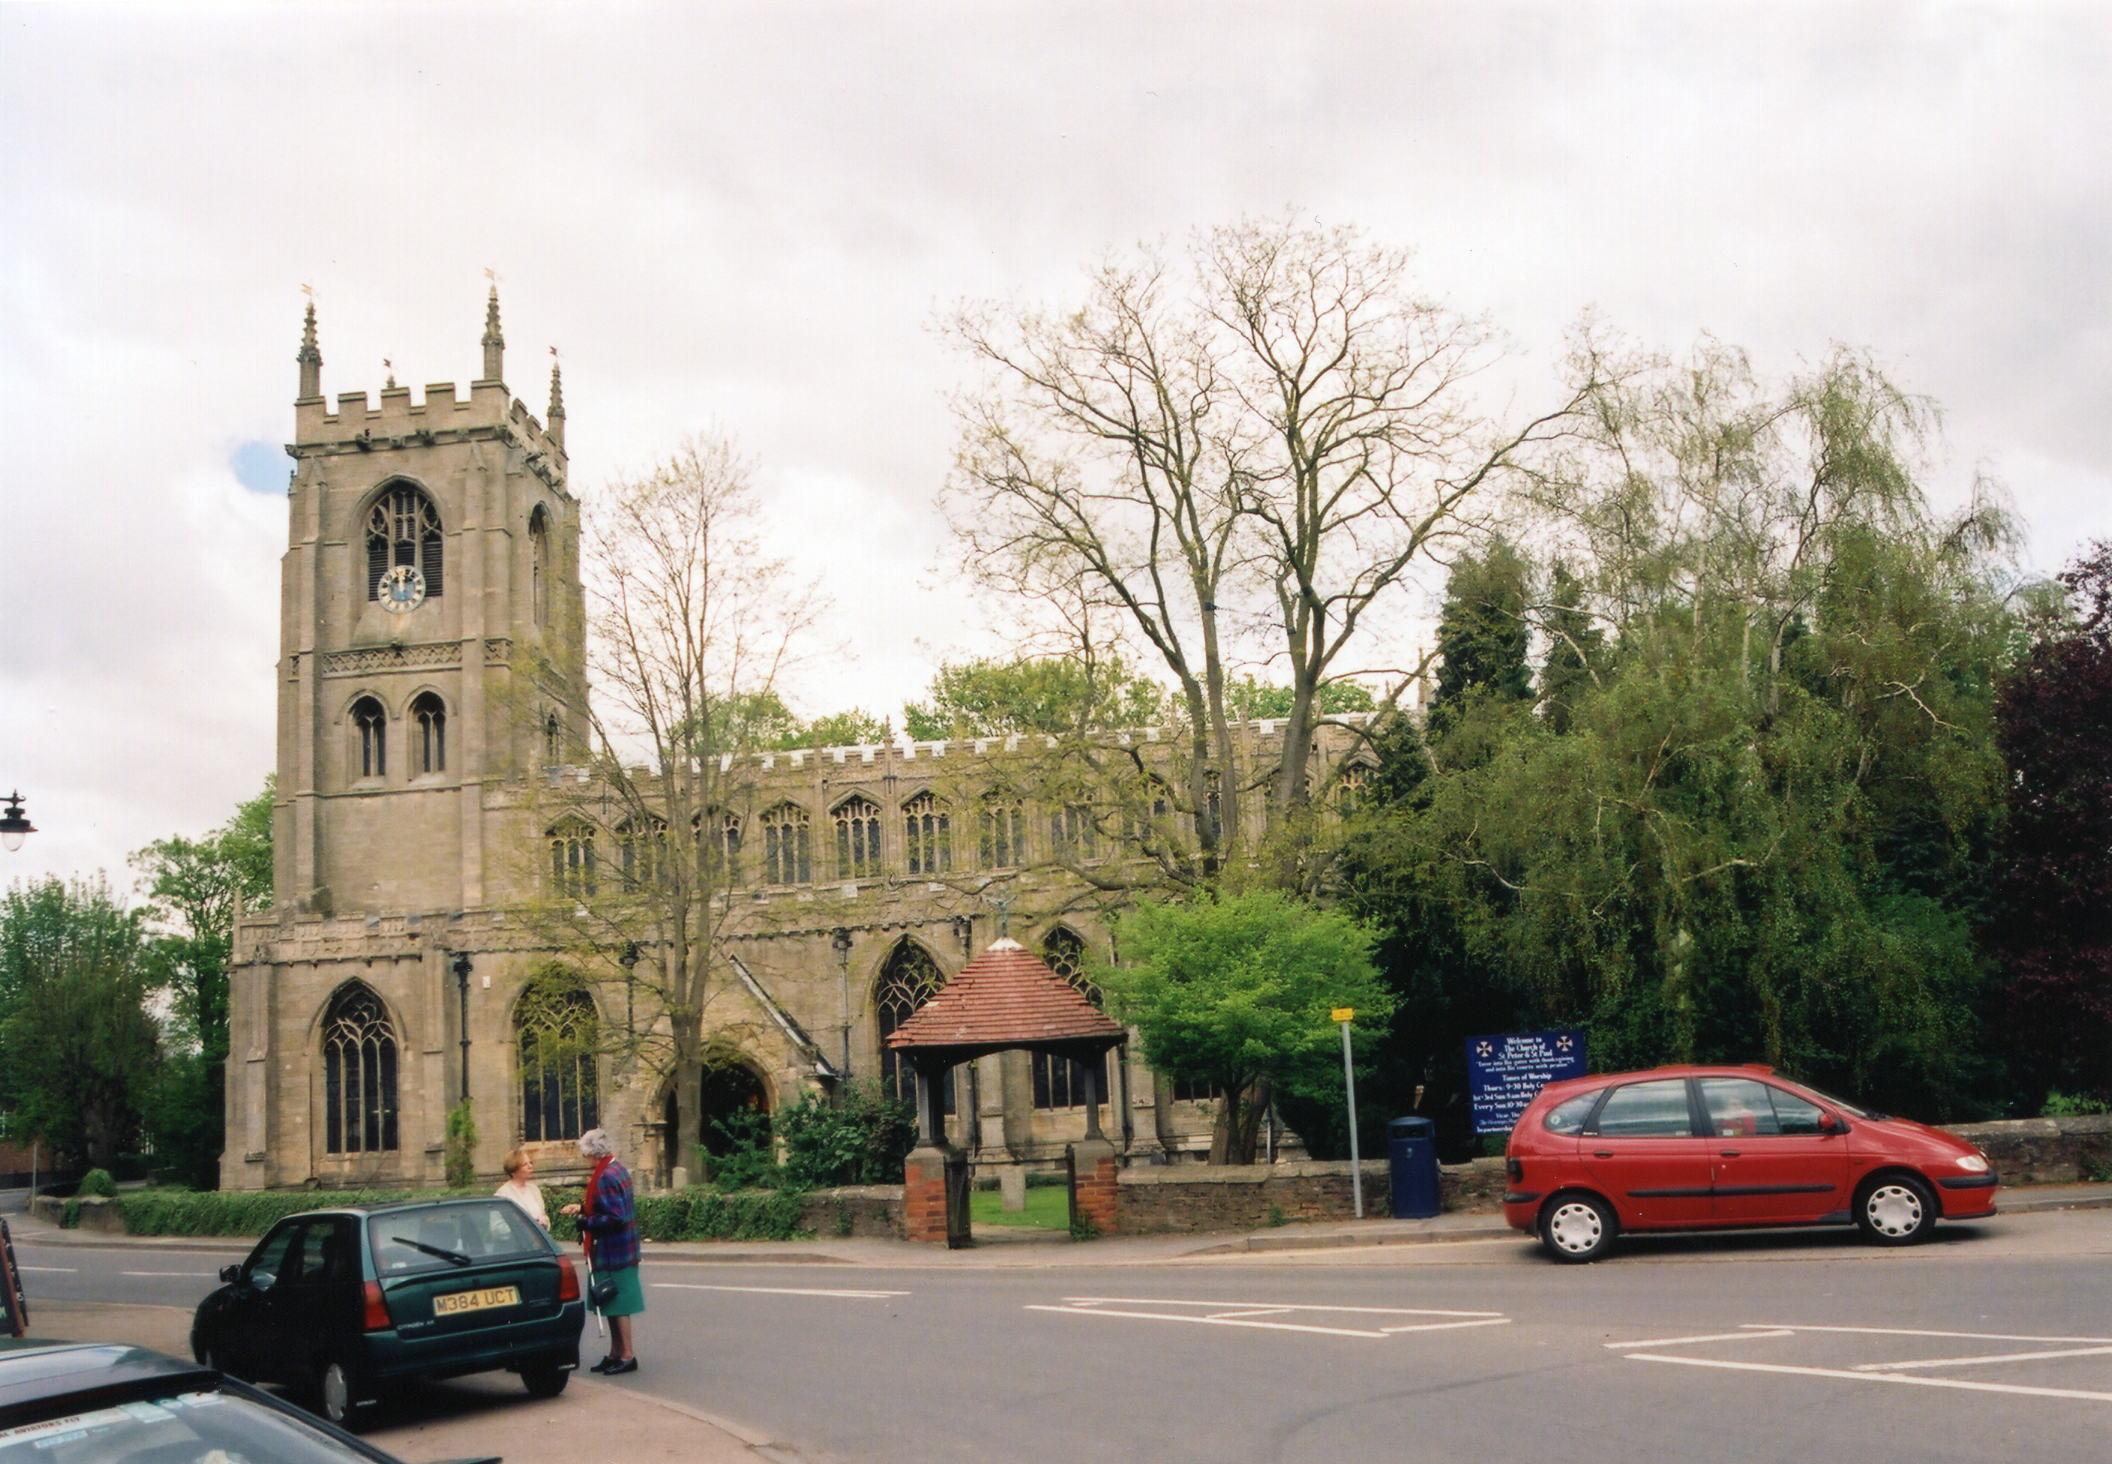 Kirton Saints Peter and Paul parish church